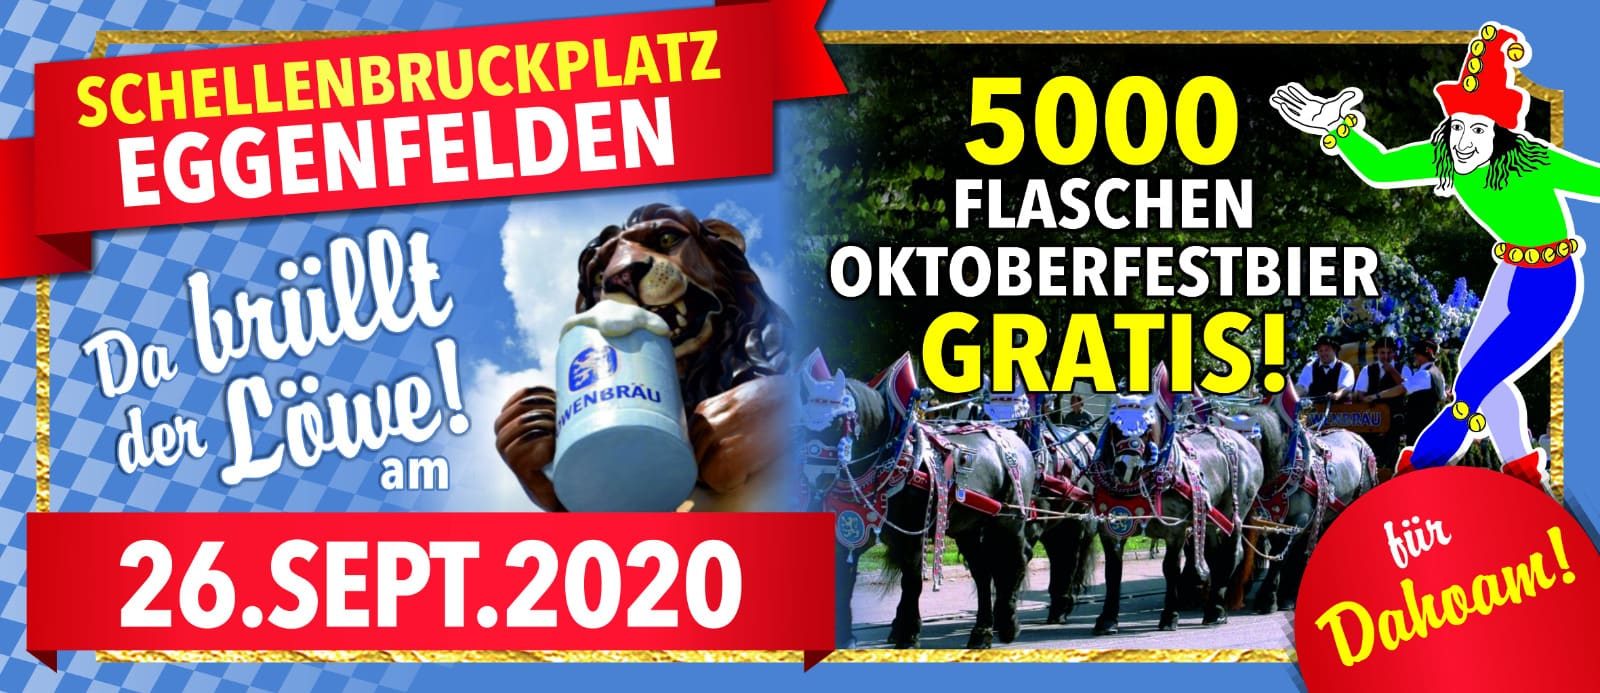 Oktoberfestbier am Schellenbruckplatz